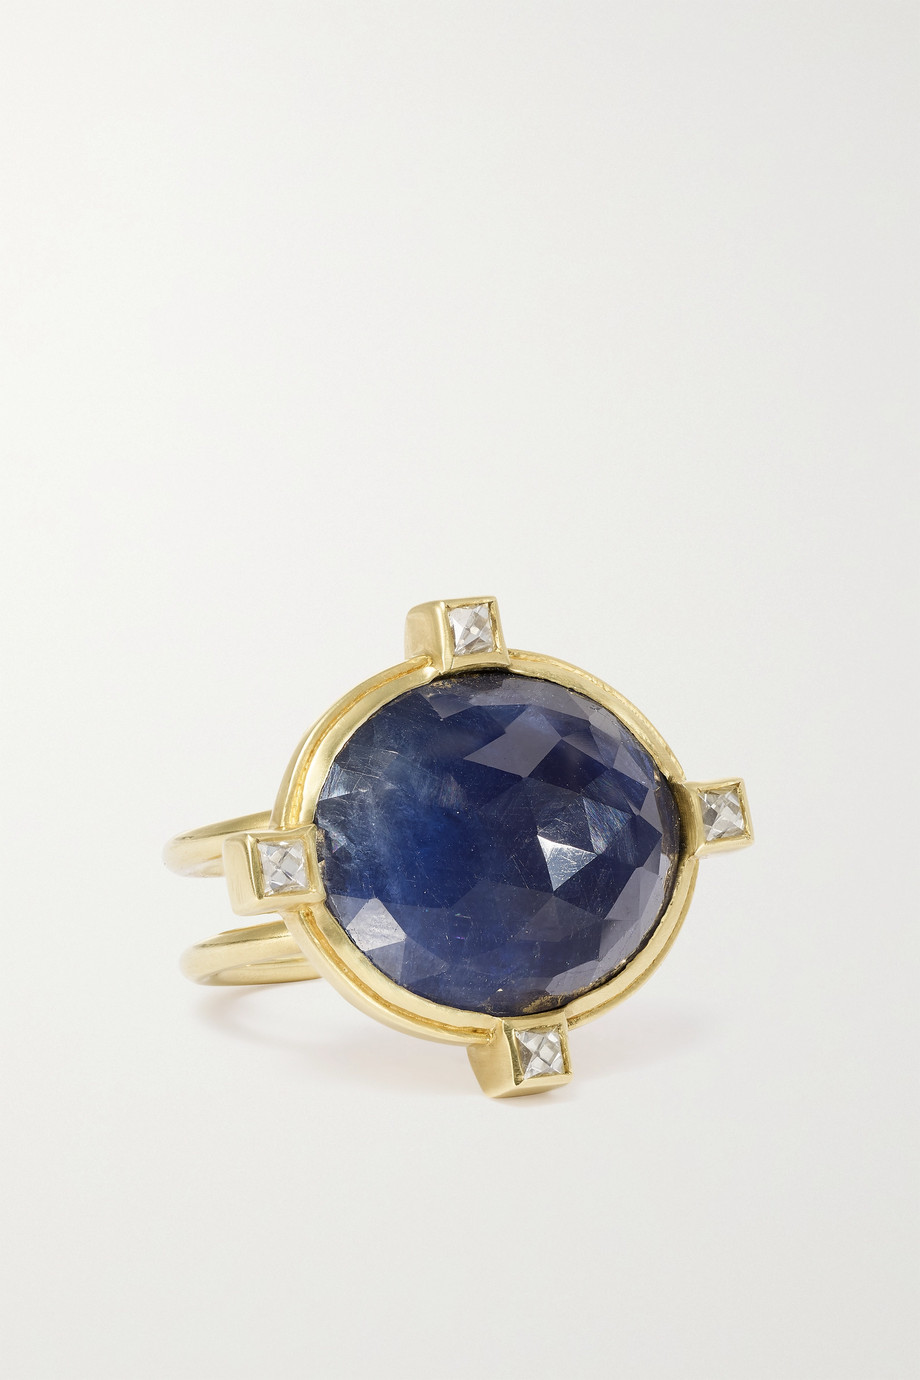 Sylva & Cie Bague en or 18carats, saphir et diamants